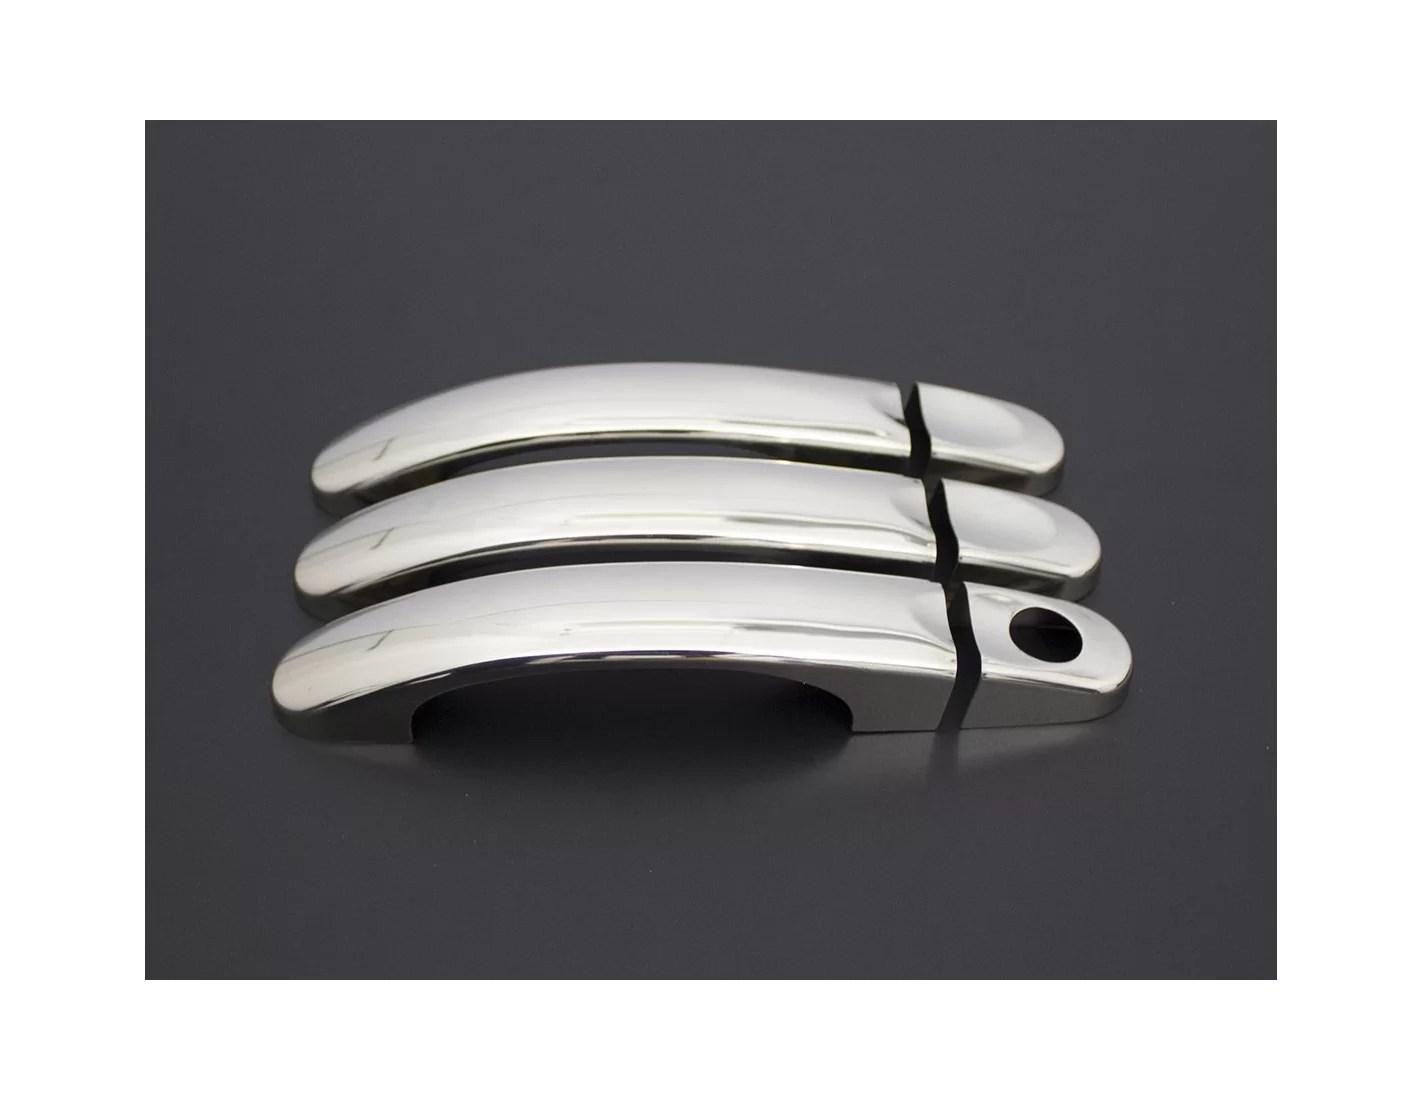 Citroen Berlingo 08.2008 3M 3D Interior Dashboard Trim Kit